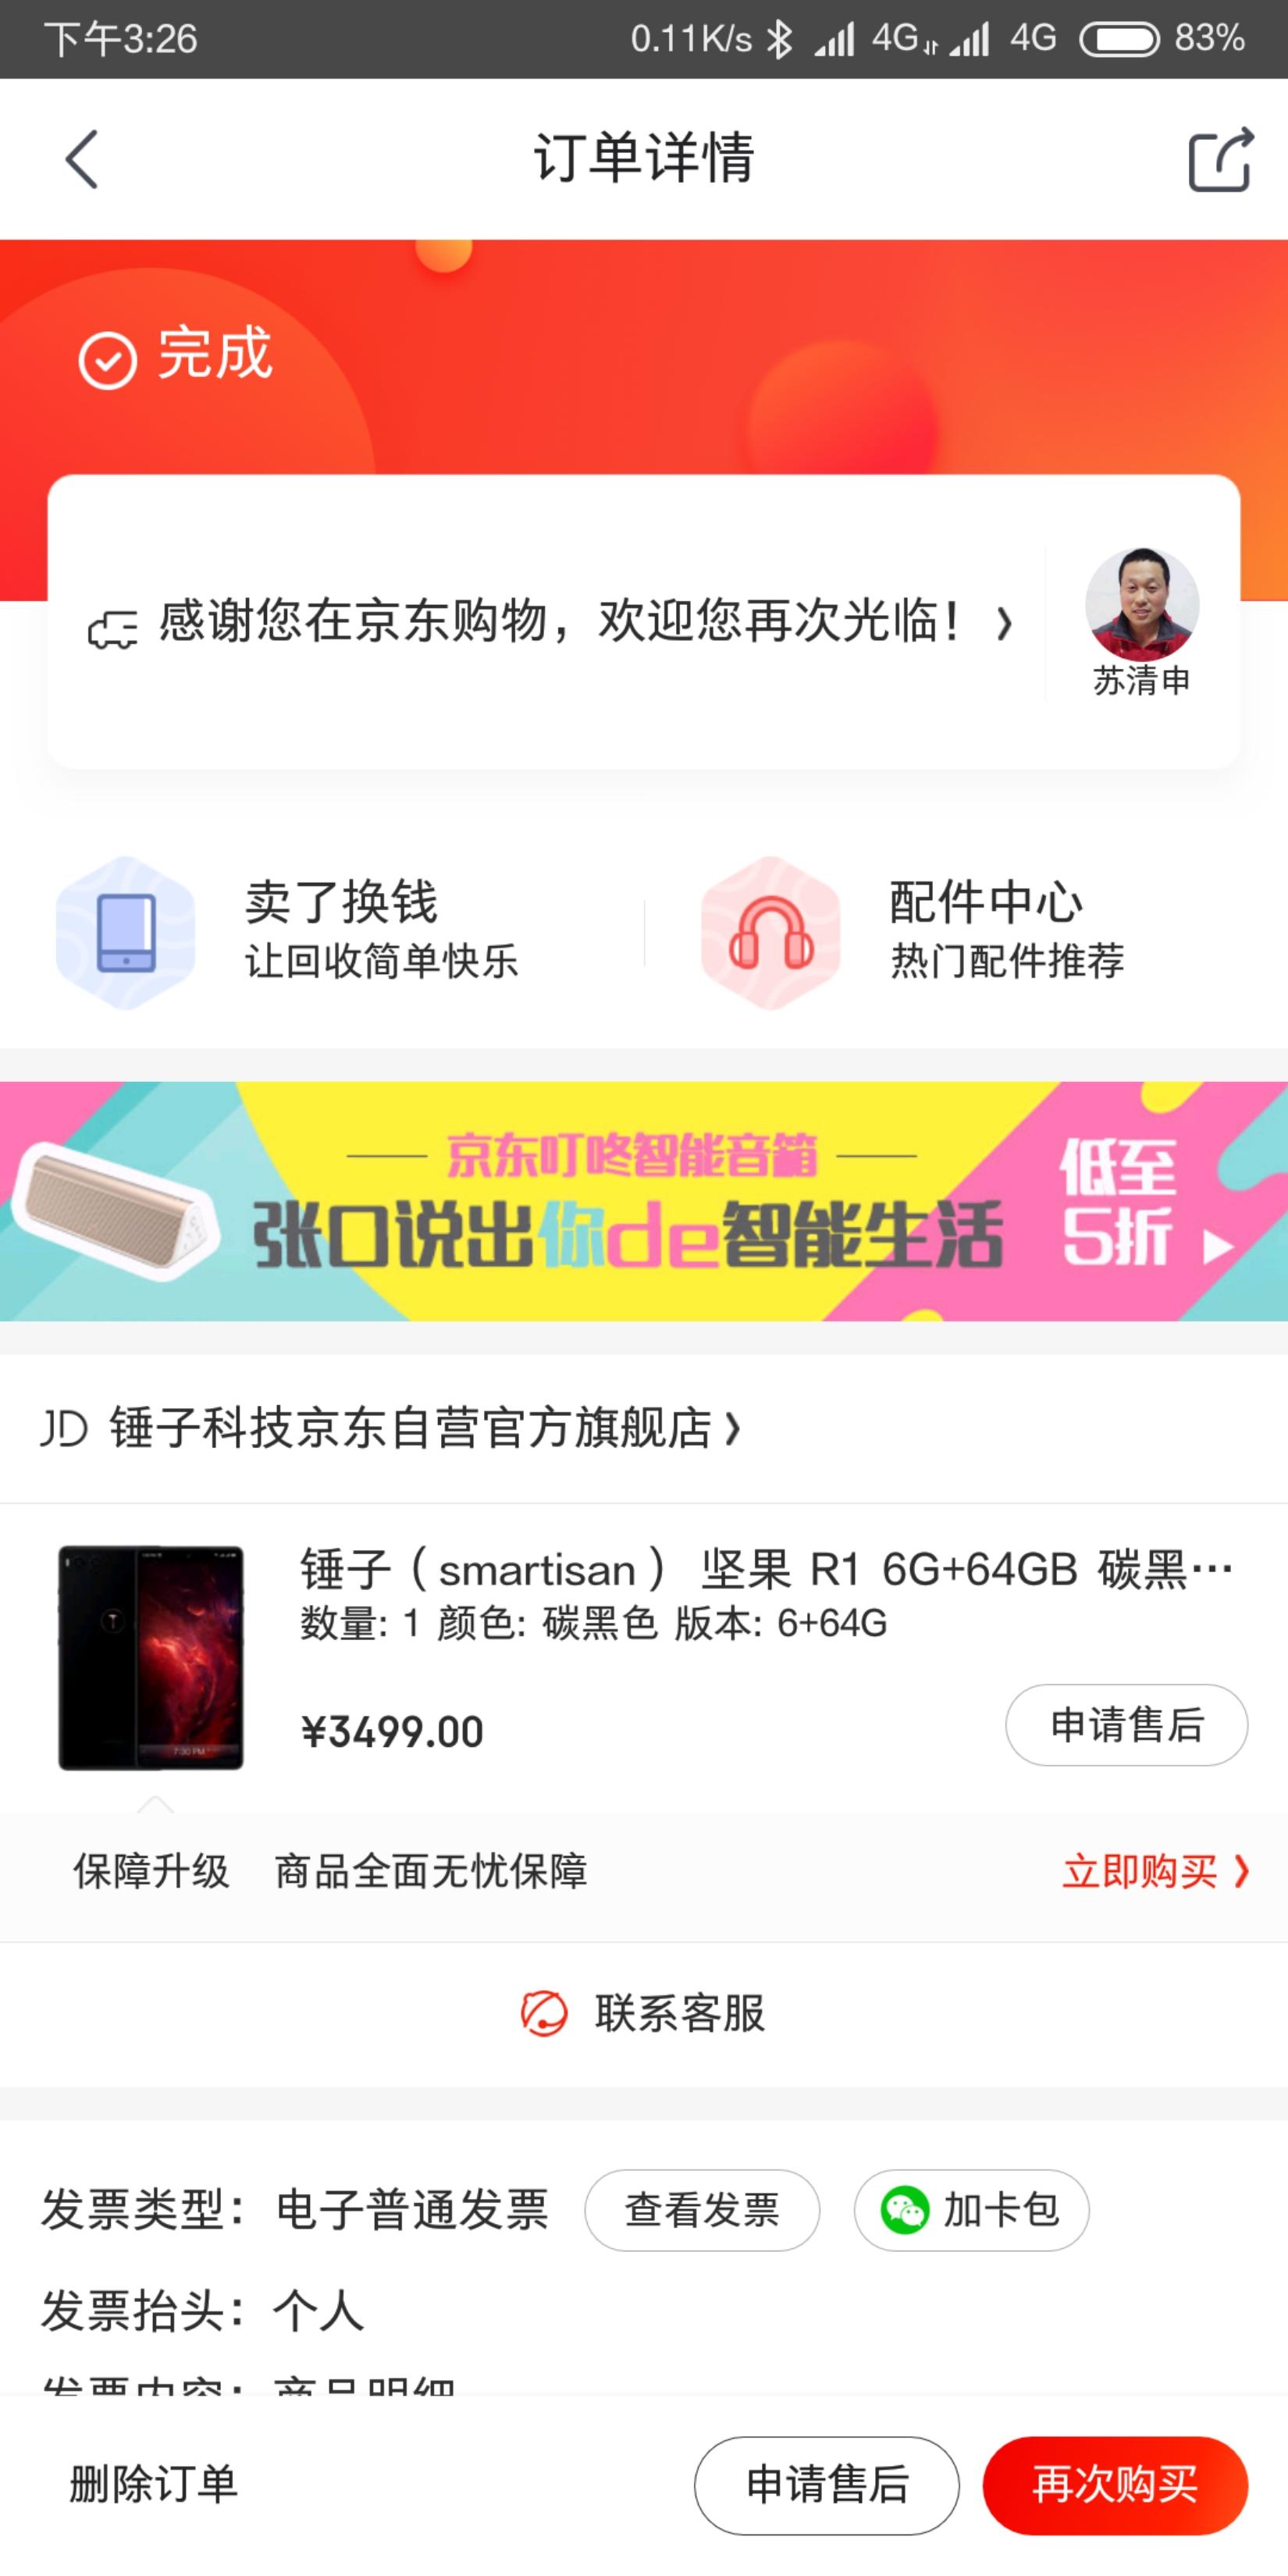 Screenshot_2018-07-12-15-26-47-521_com.jingdong.app.mall.png